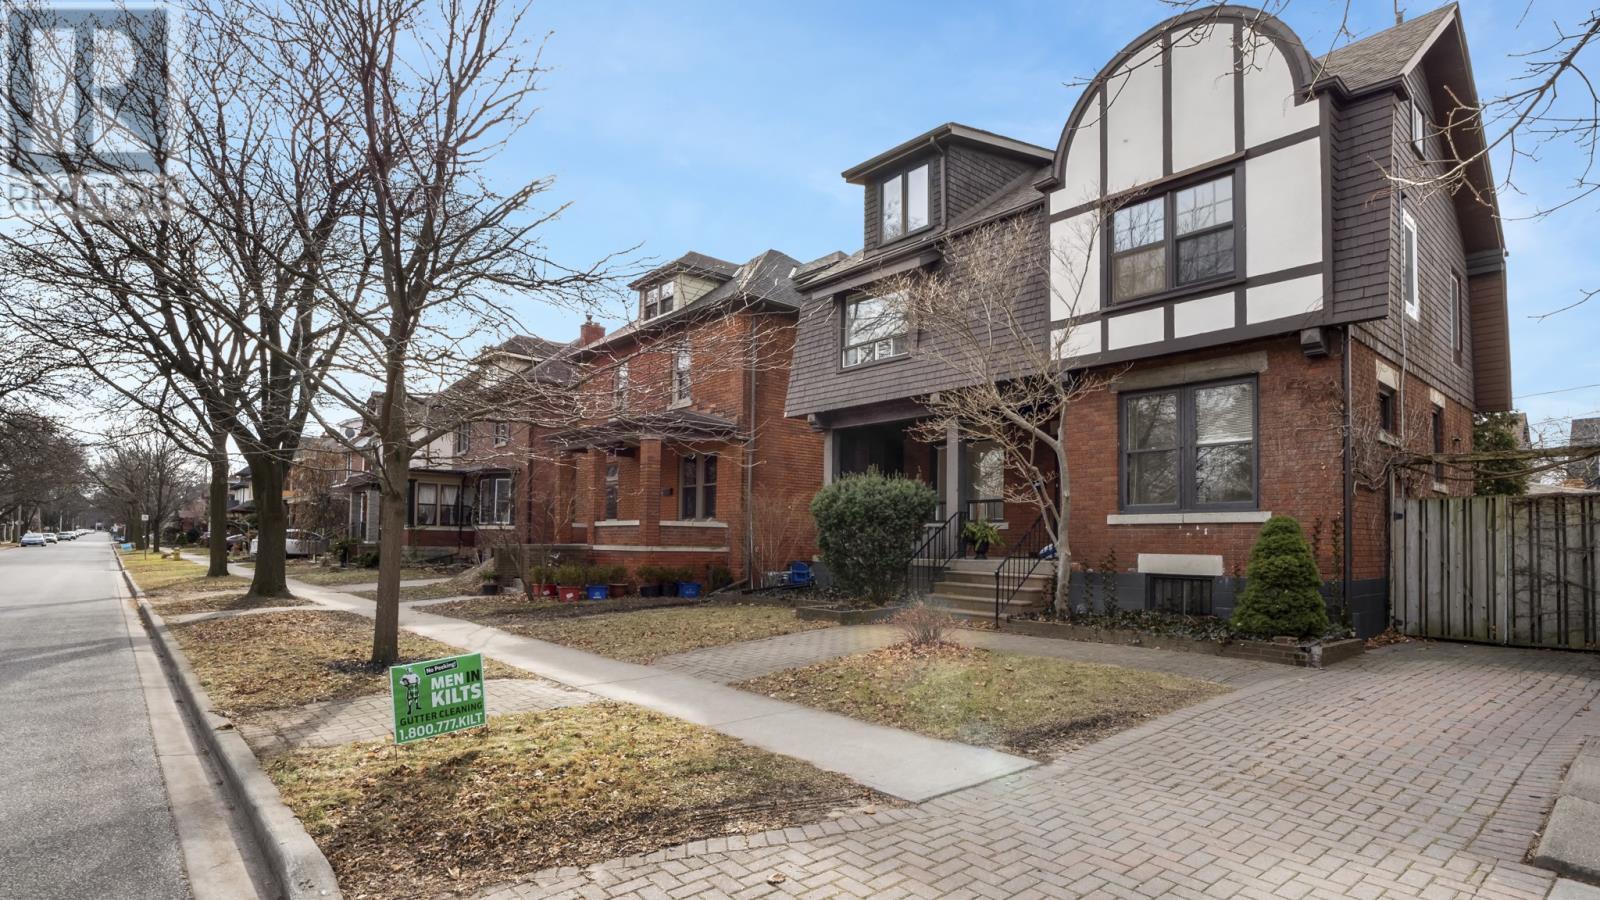 995 CHILVER, Windsor - $2,400 (20001151